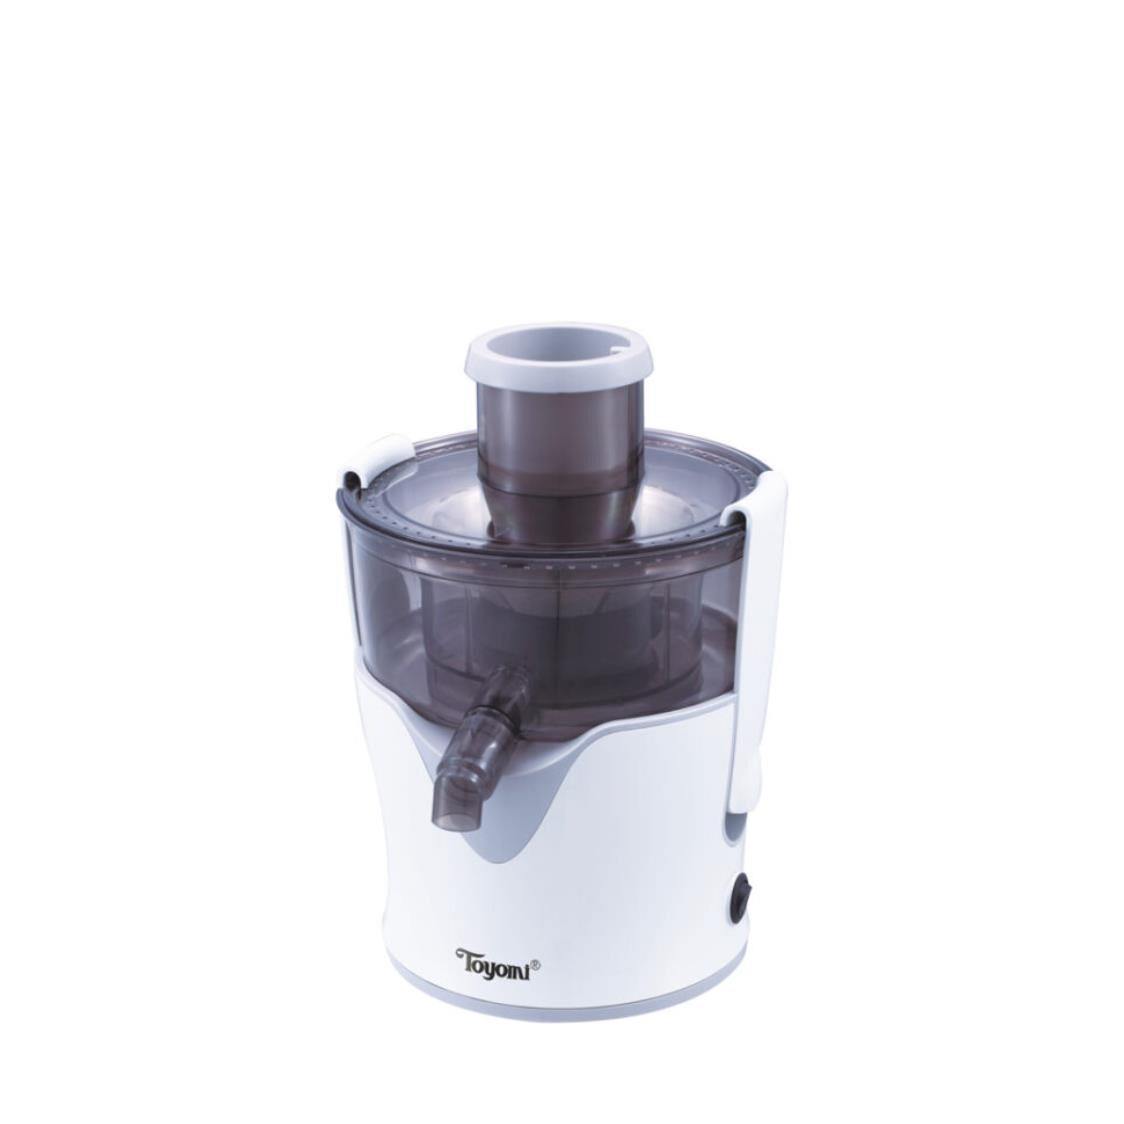 Toyomi JE7216 Electric Juice Extractor